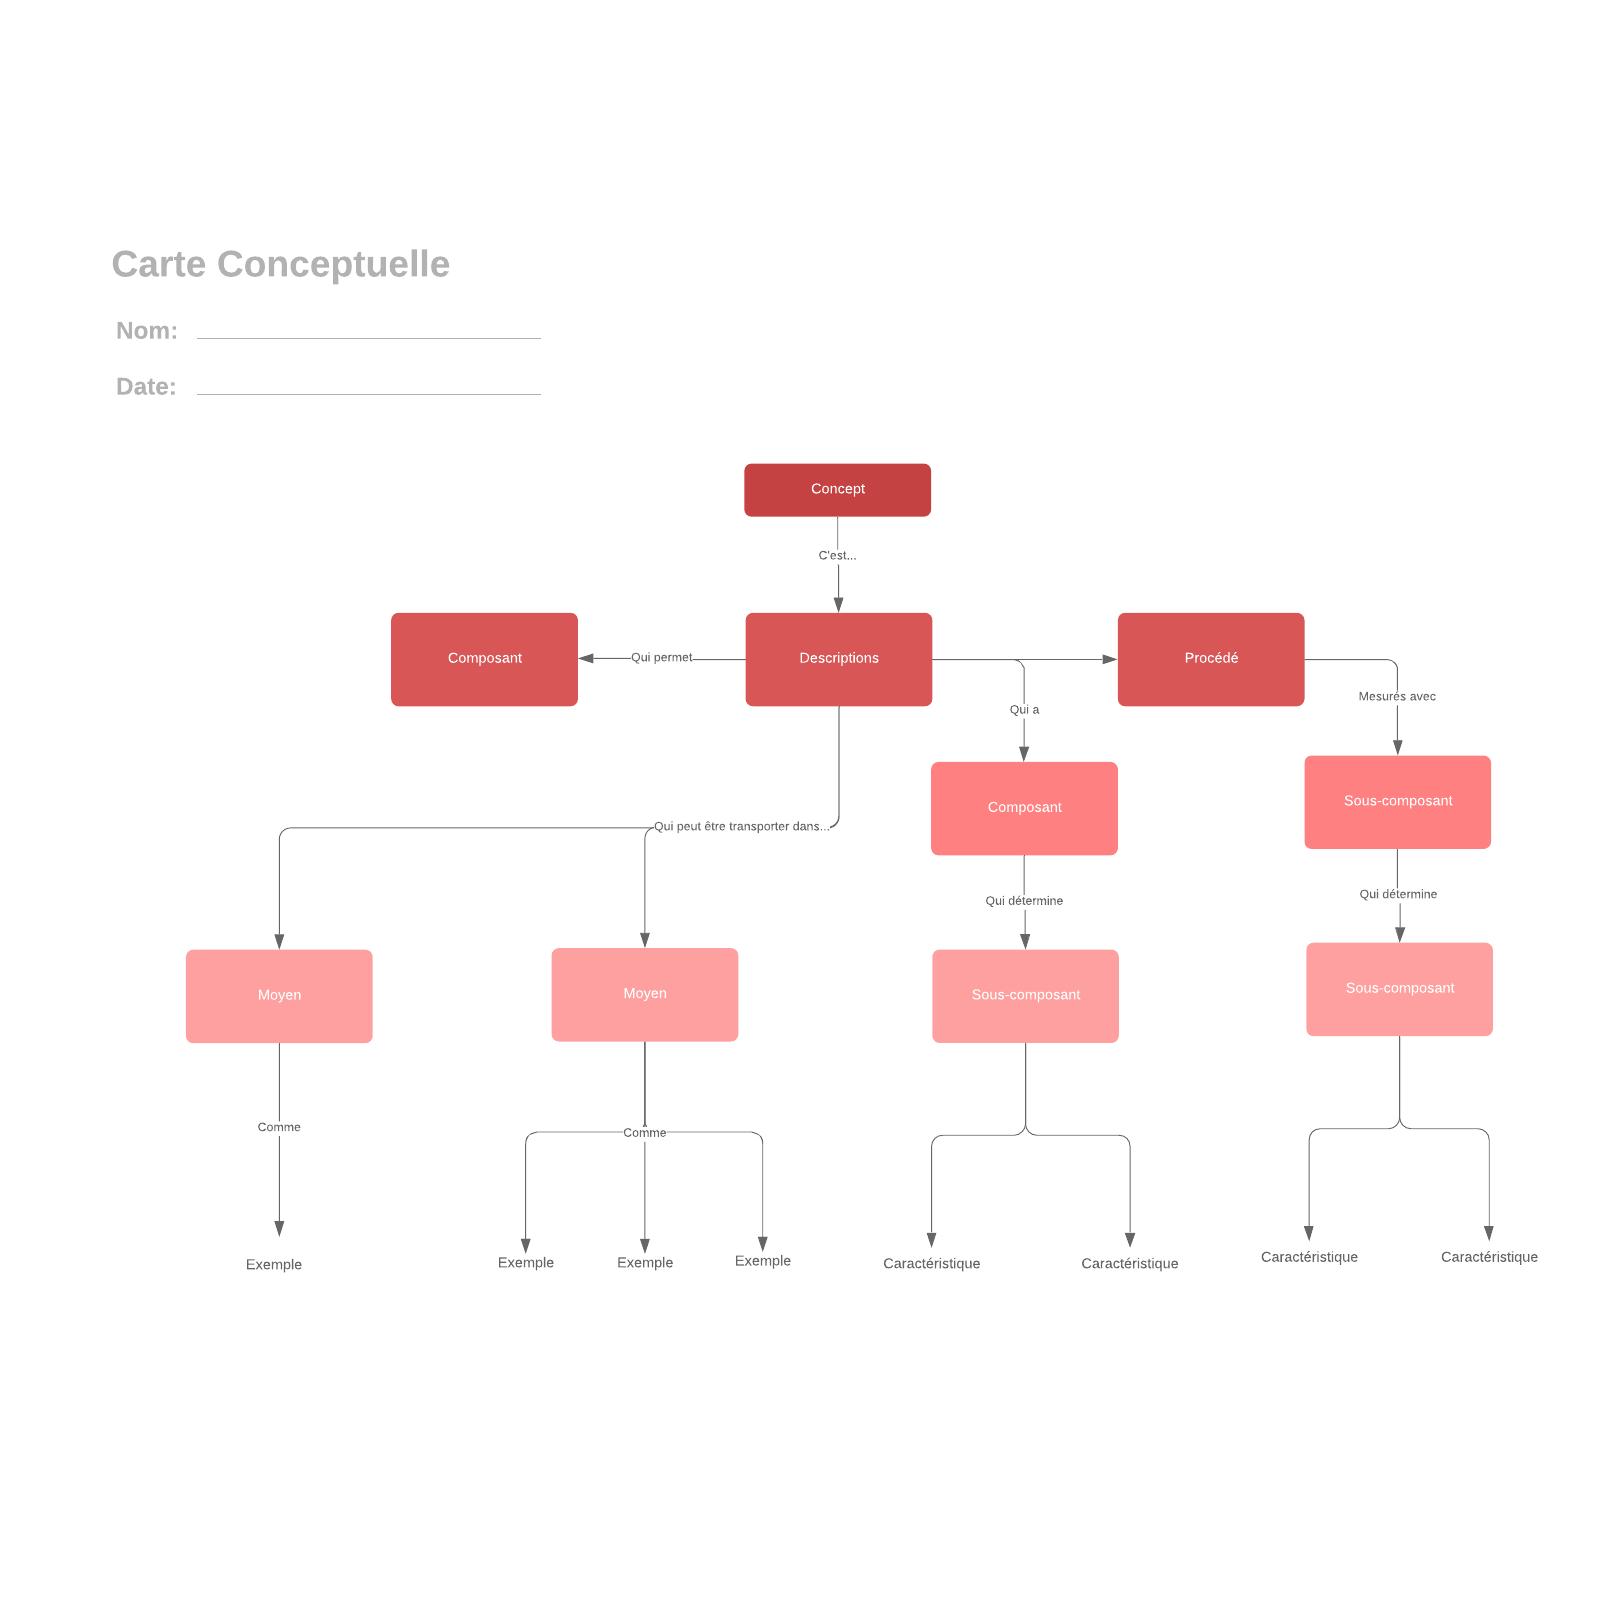 exemple de carte conceptuelle simple